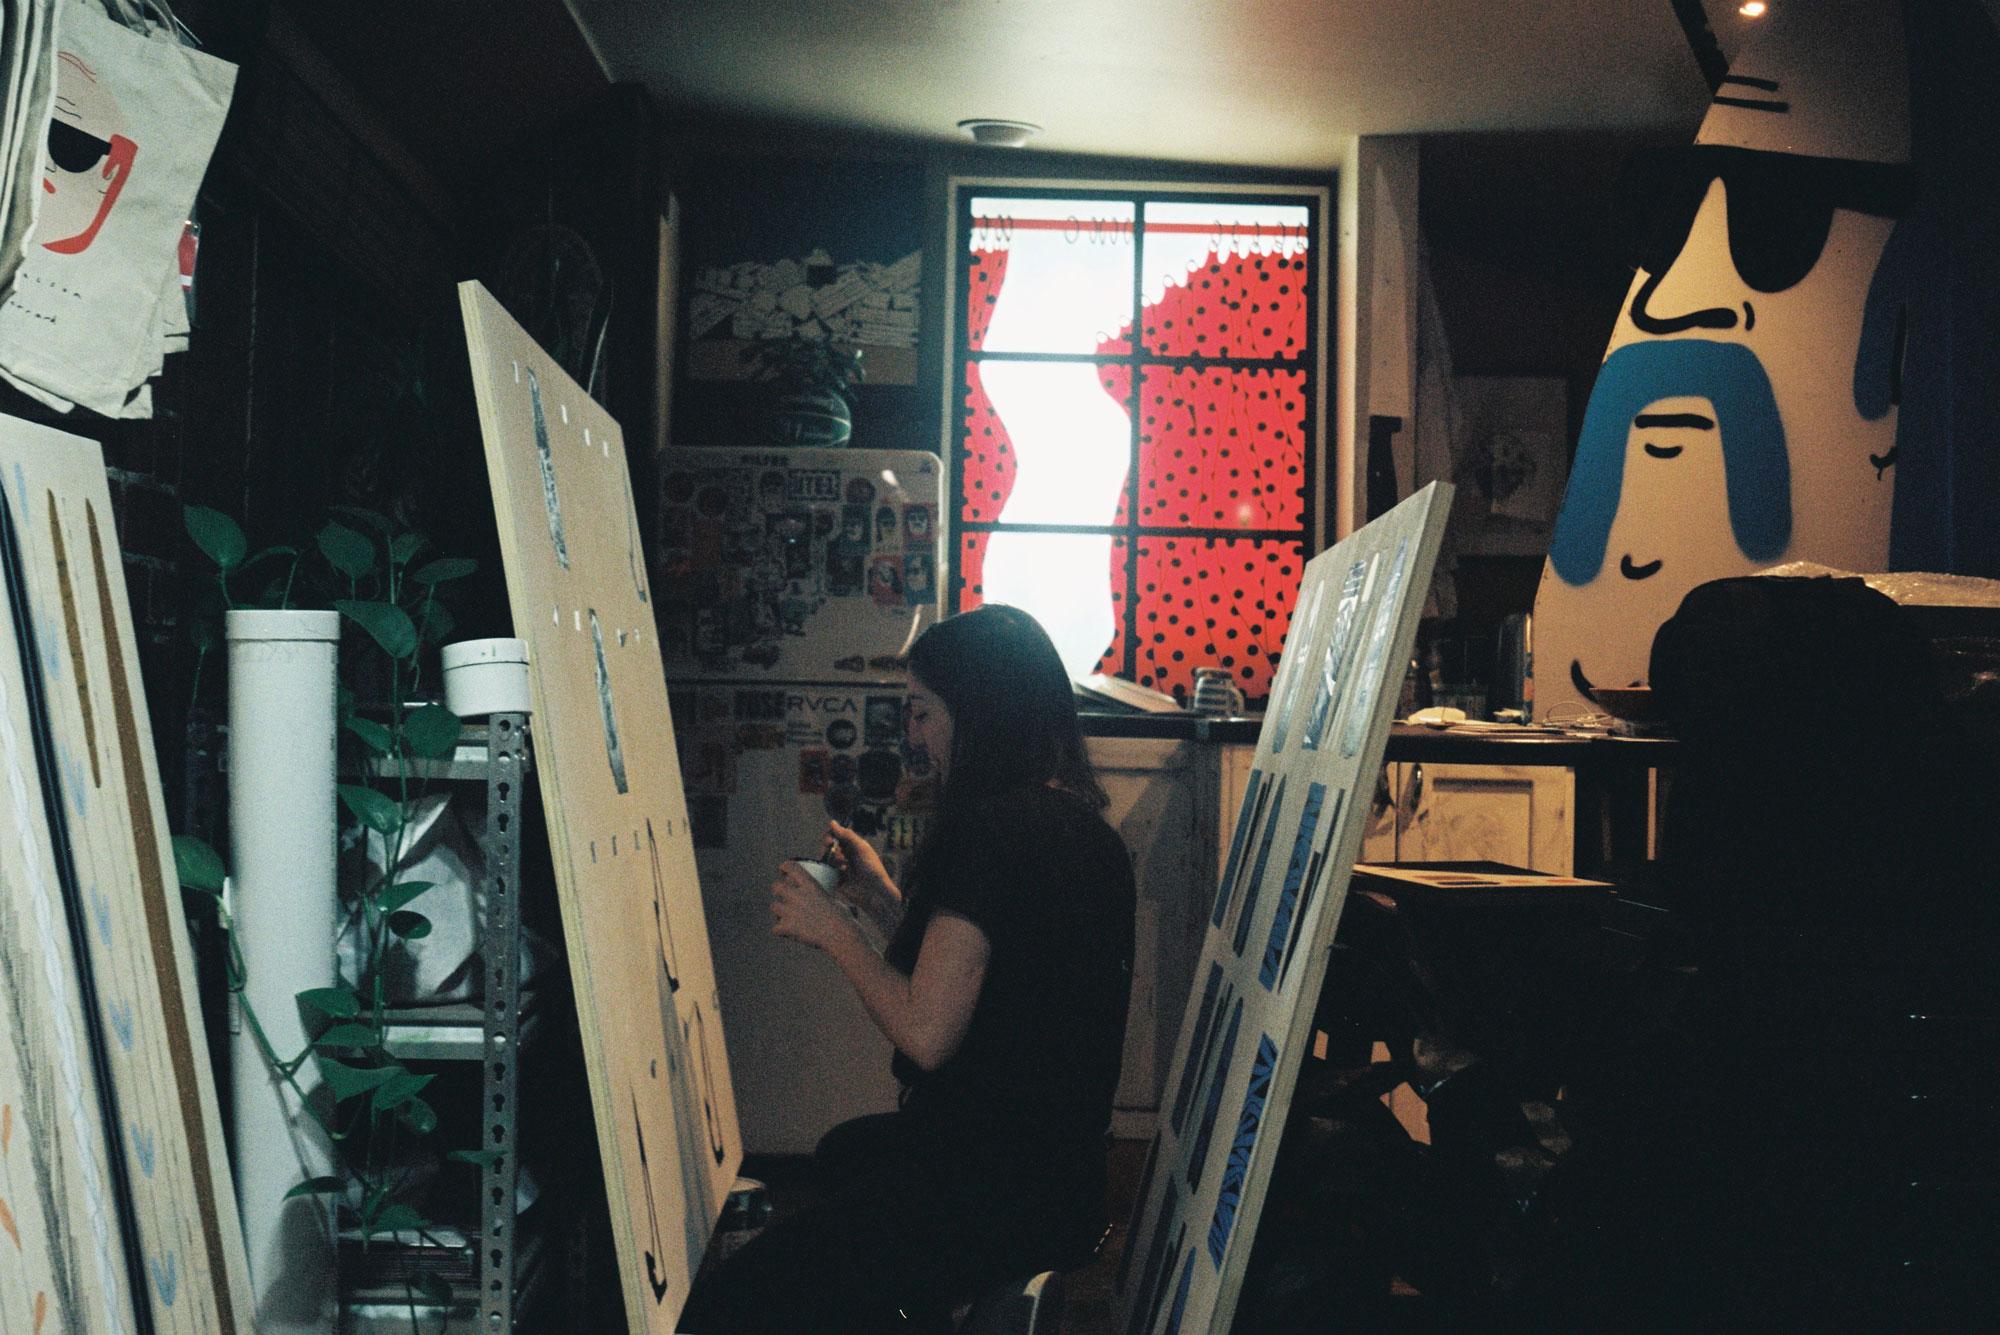 tom-gerrard-artist-barry-mansfield-photo-3.JPG